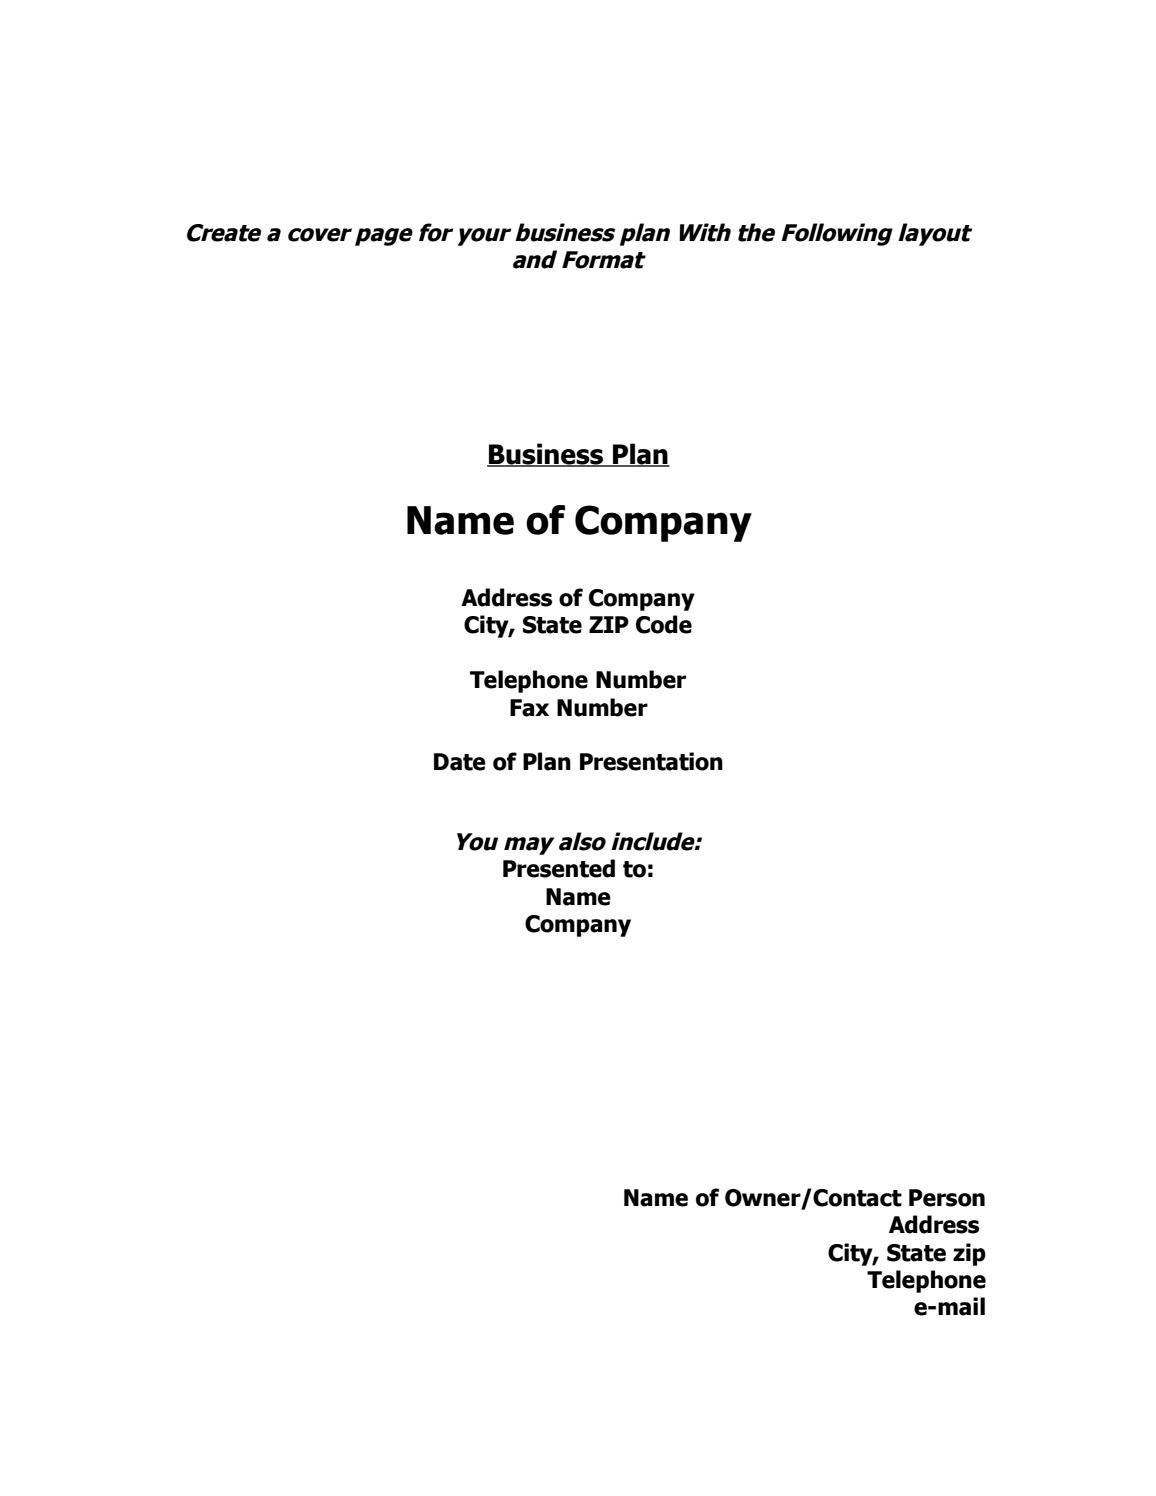 Apollo Business Plan Template Sample By Apollo Business Plan Templete Issuu